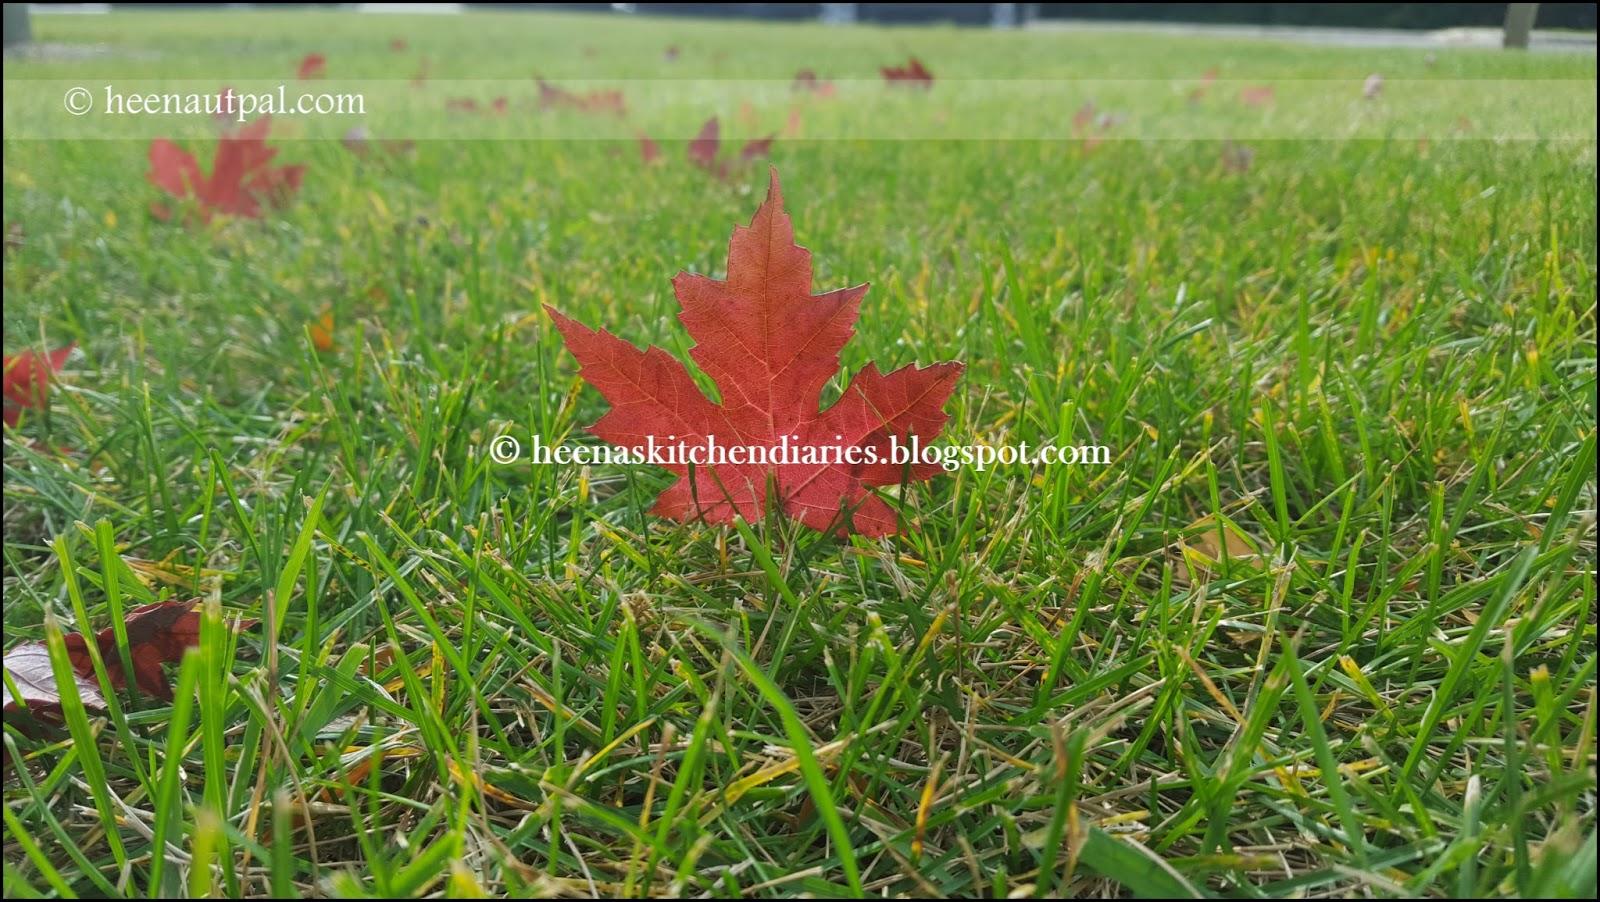 Heena\'s Kitchen Diaries: Season of Fall colors | Autumn 2015